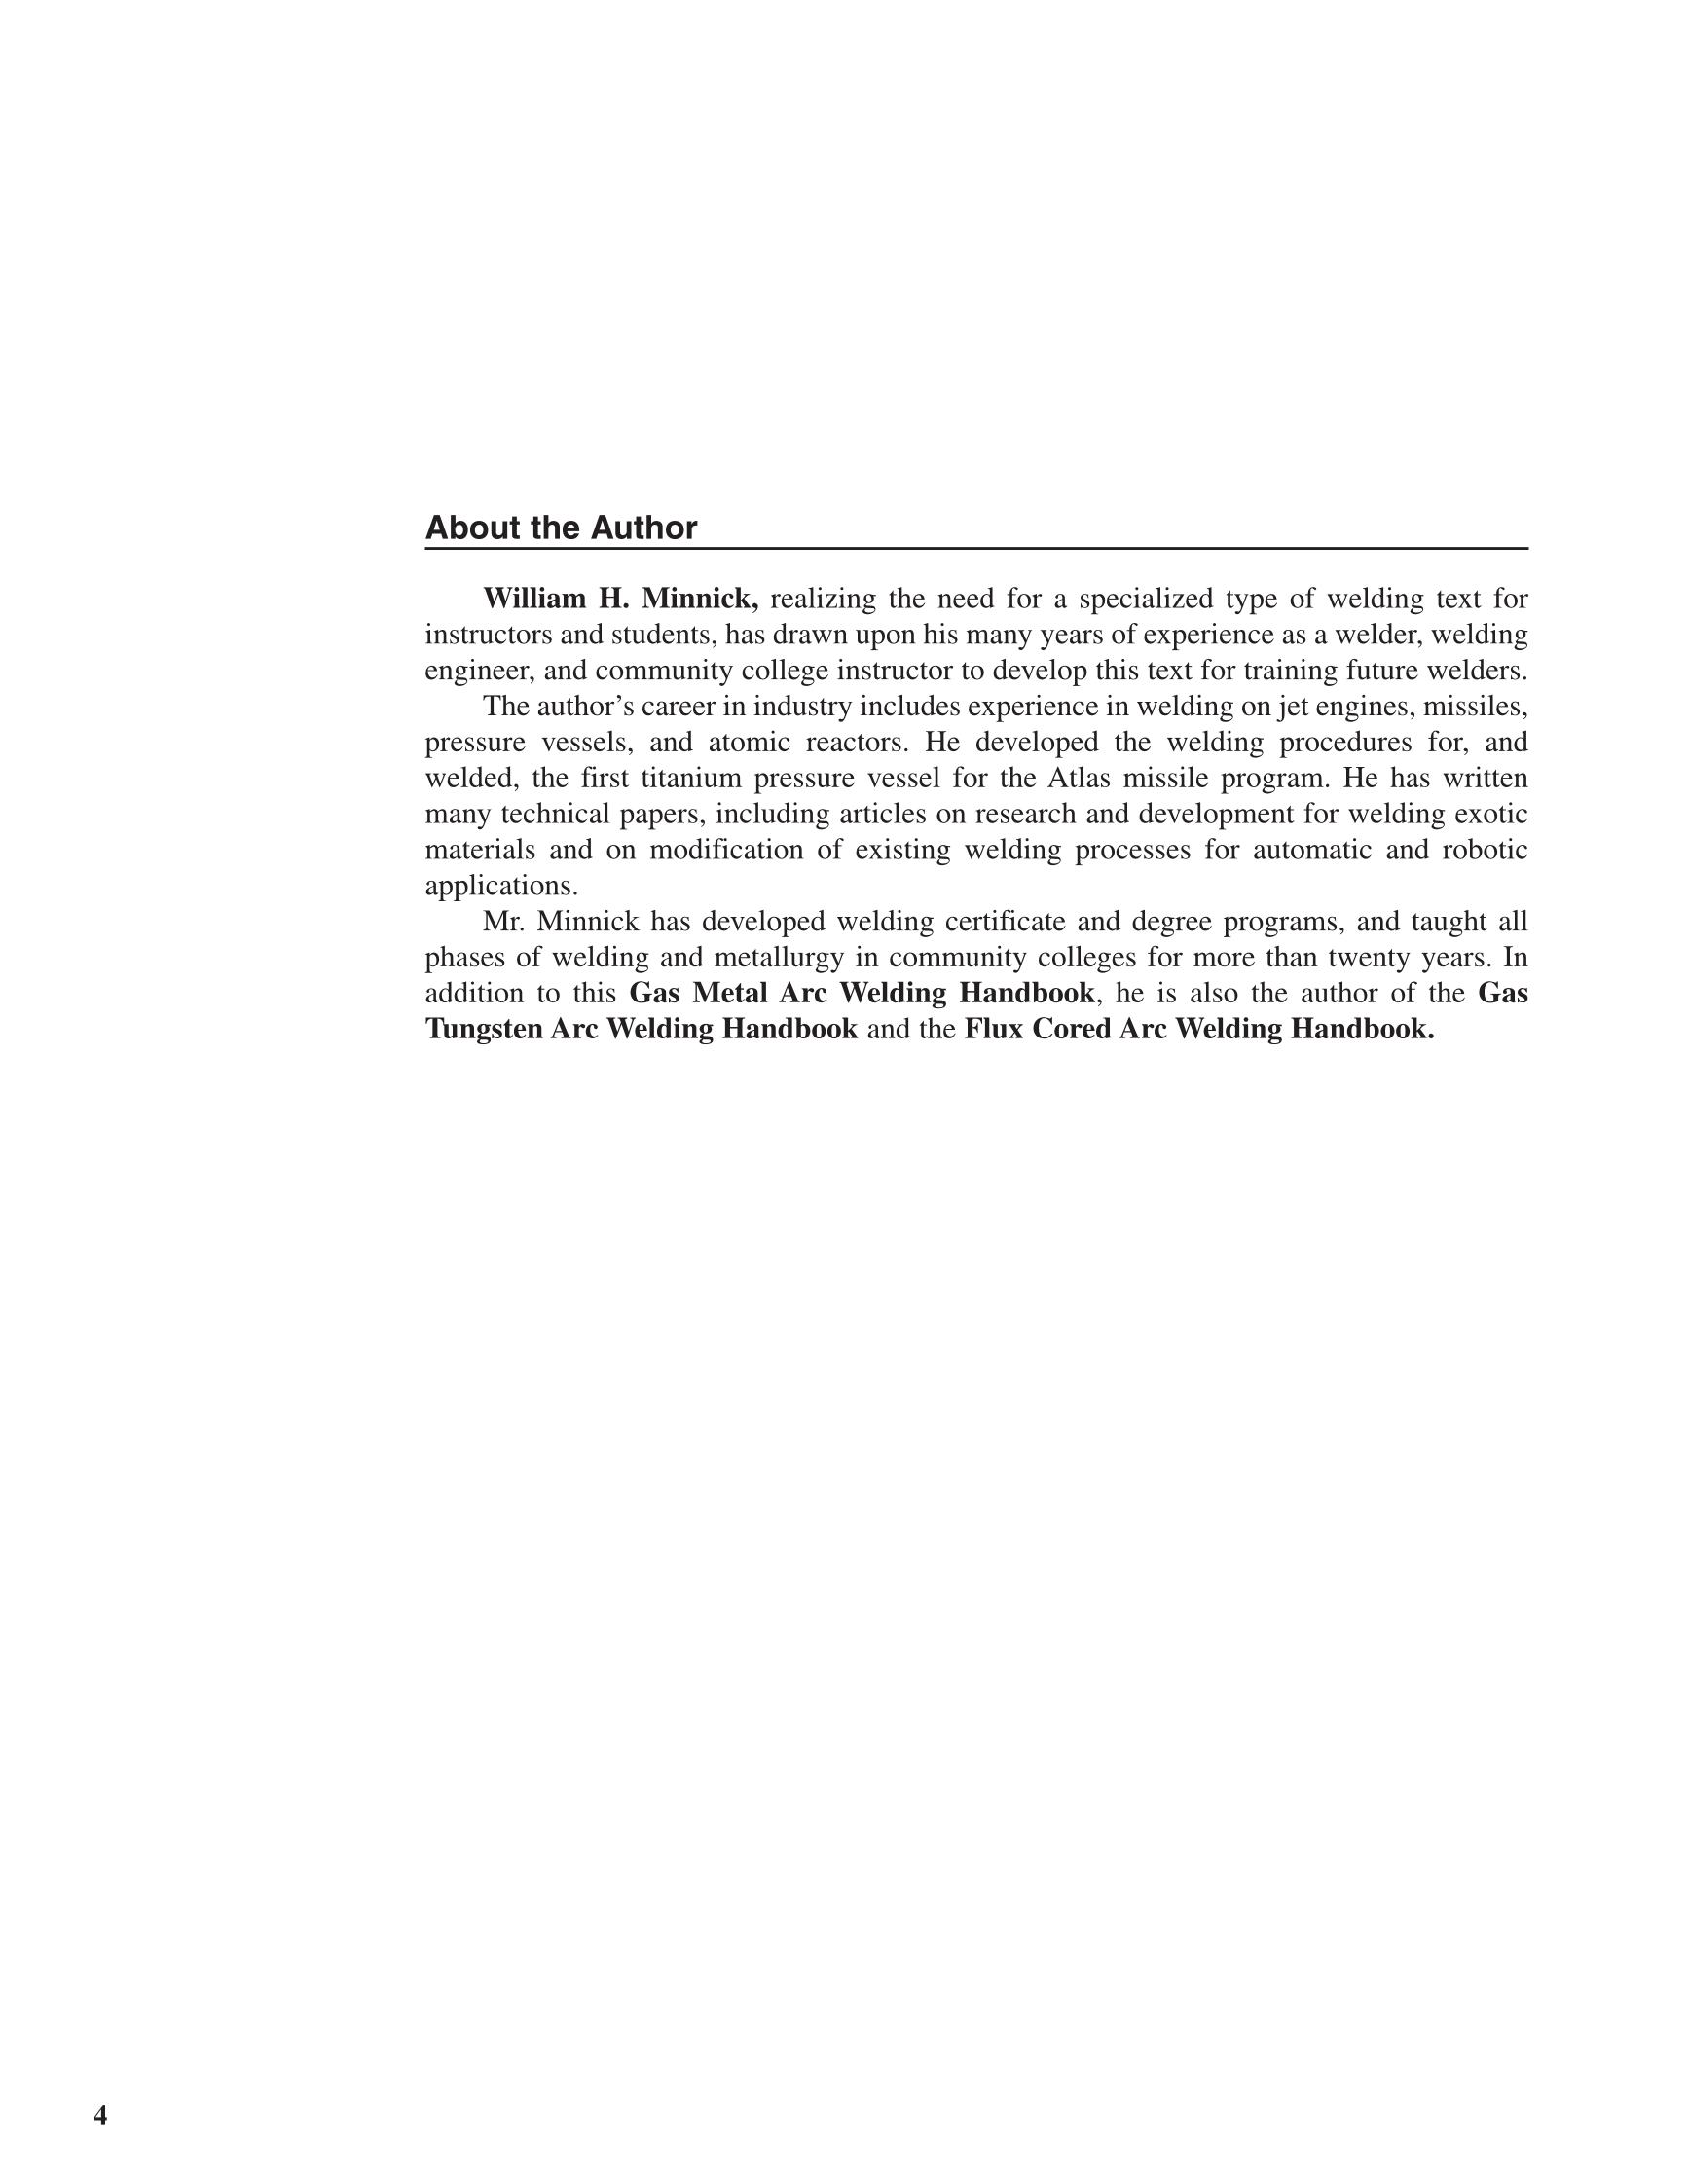 Printable Gas Metal Arc Welding Handbook 5th Edition Page 4